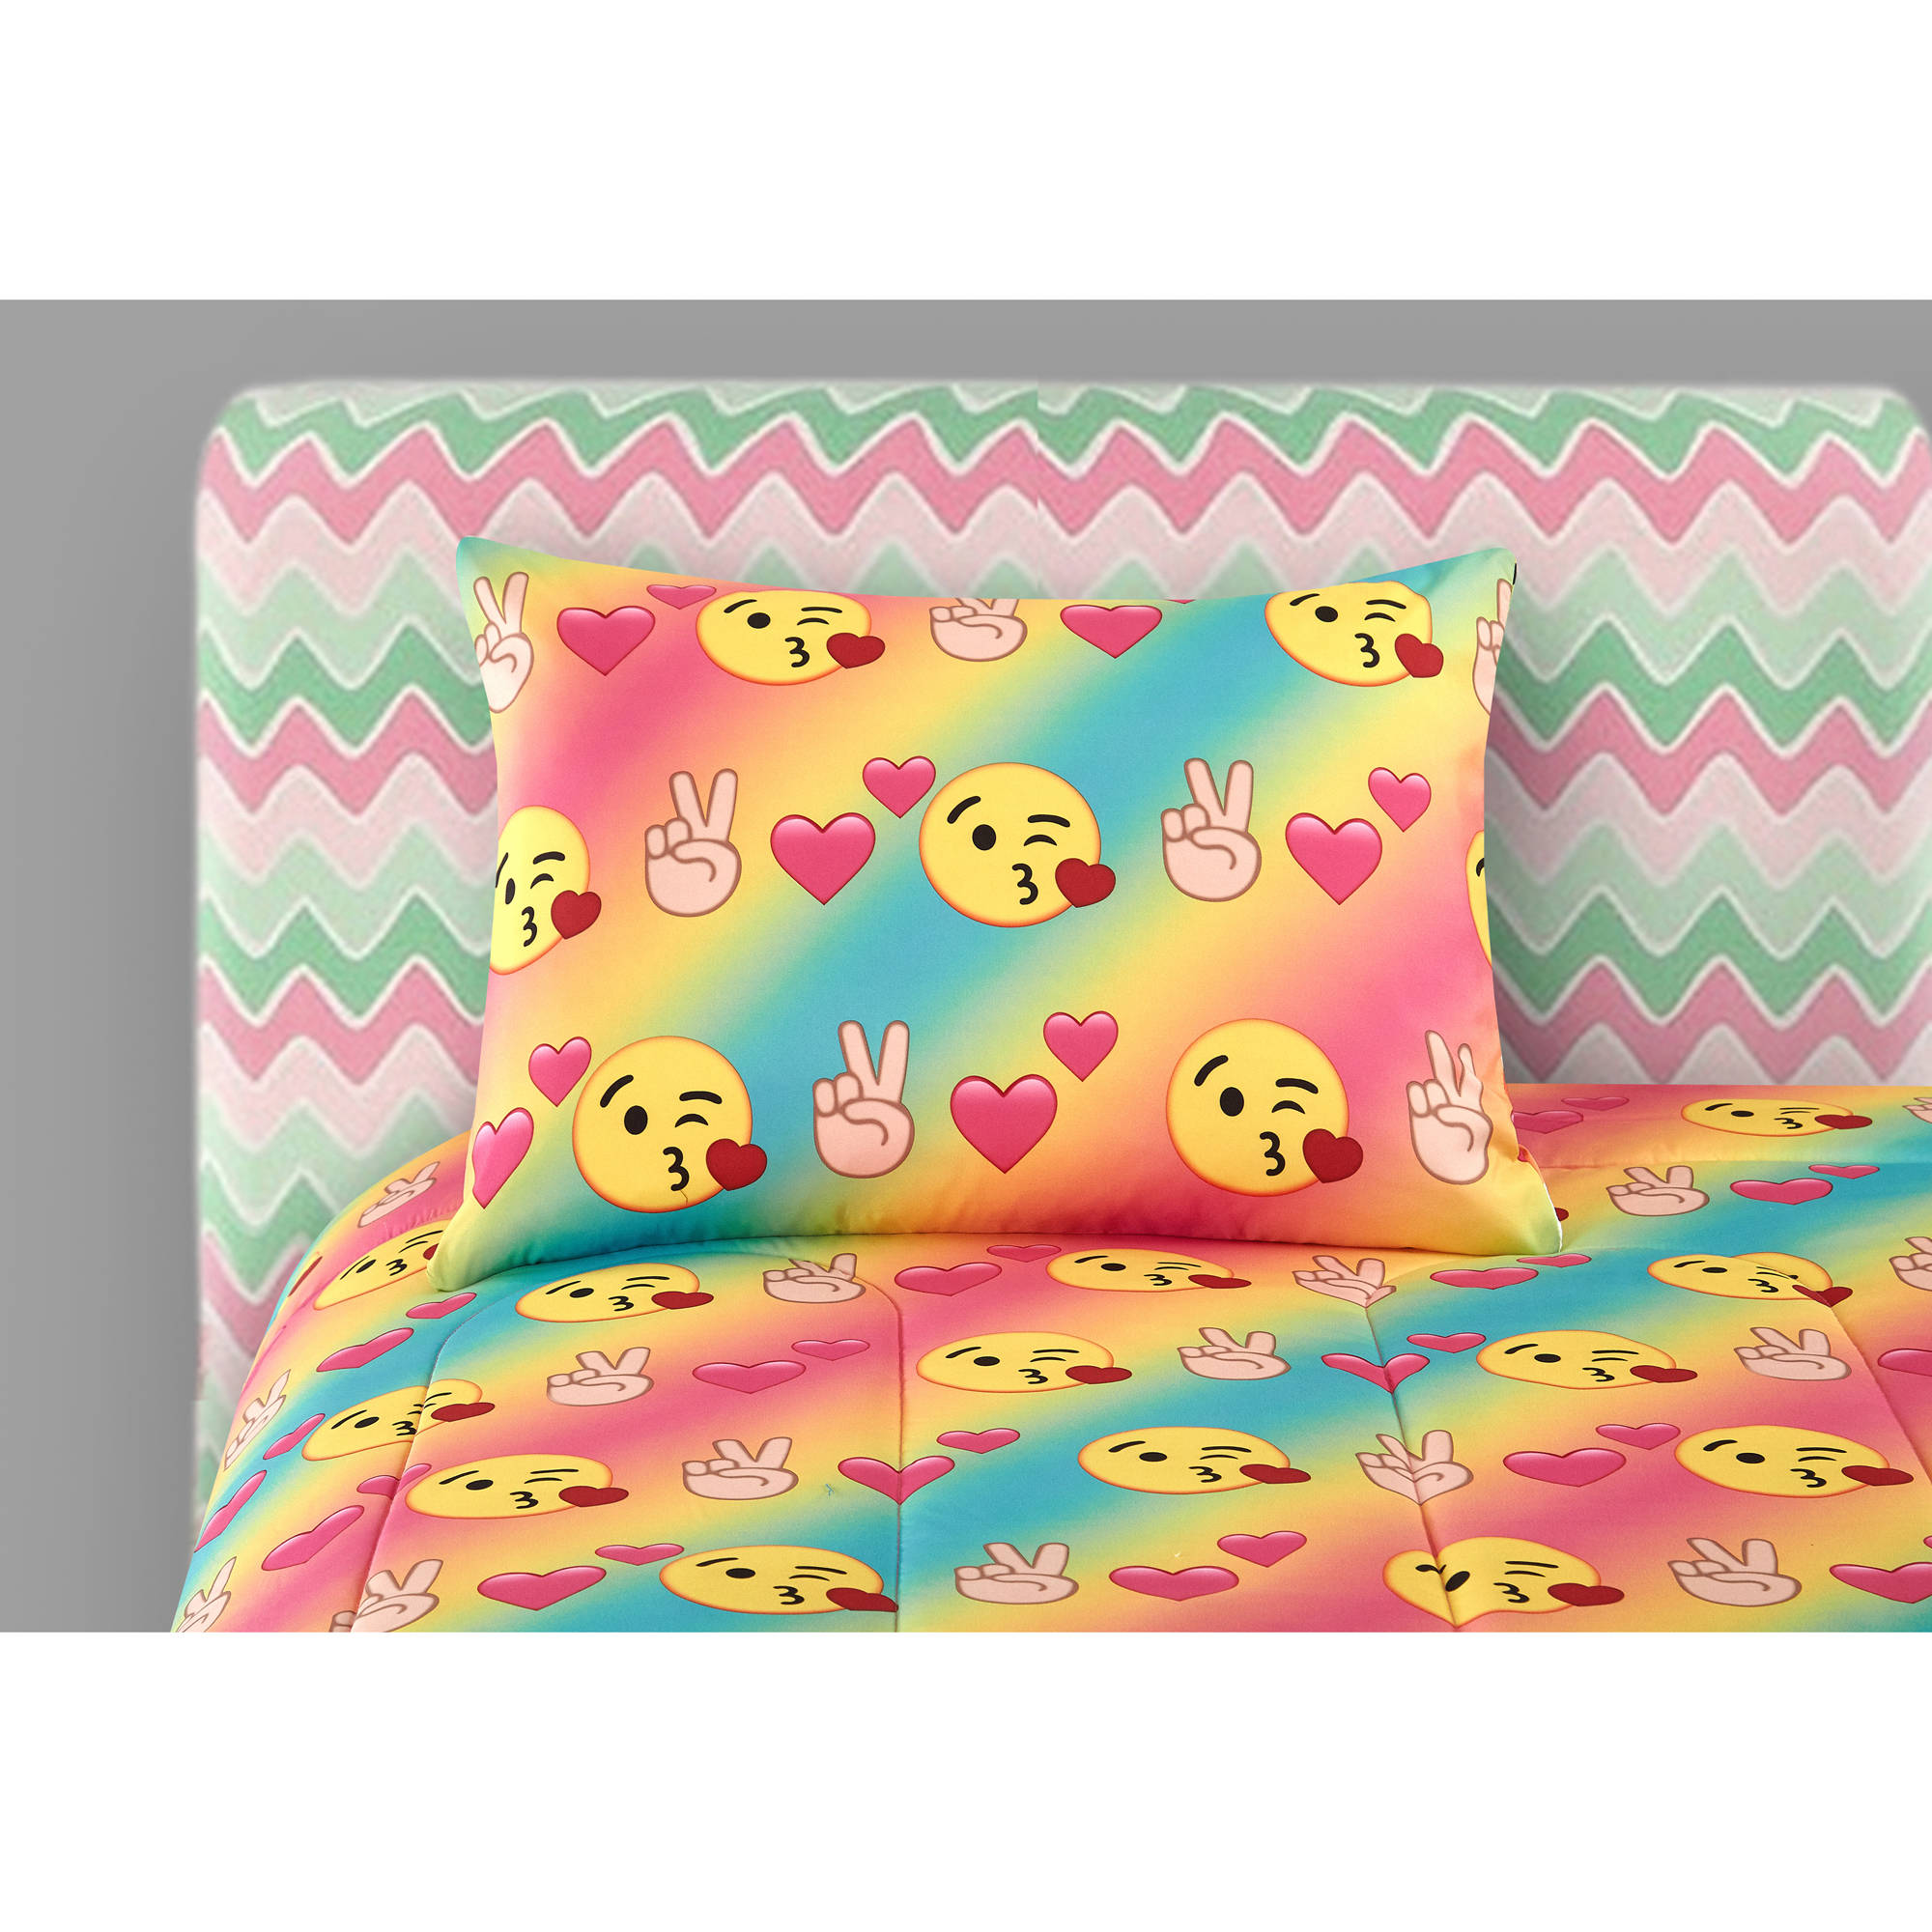 sheets lot high quality emoji - photo #24